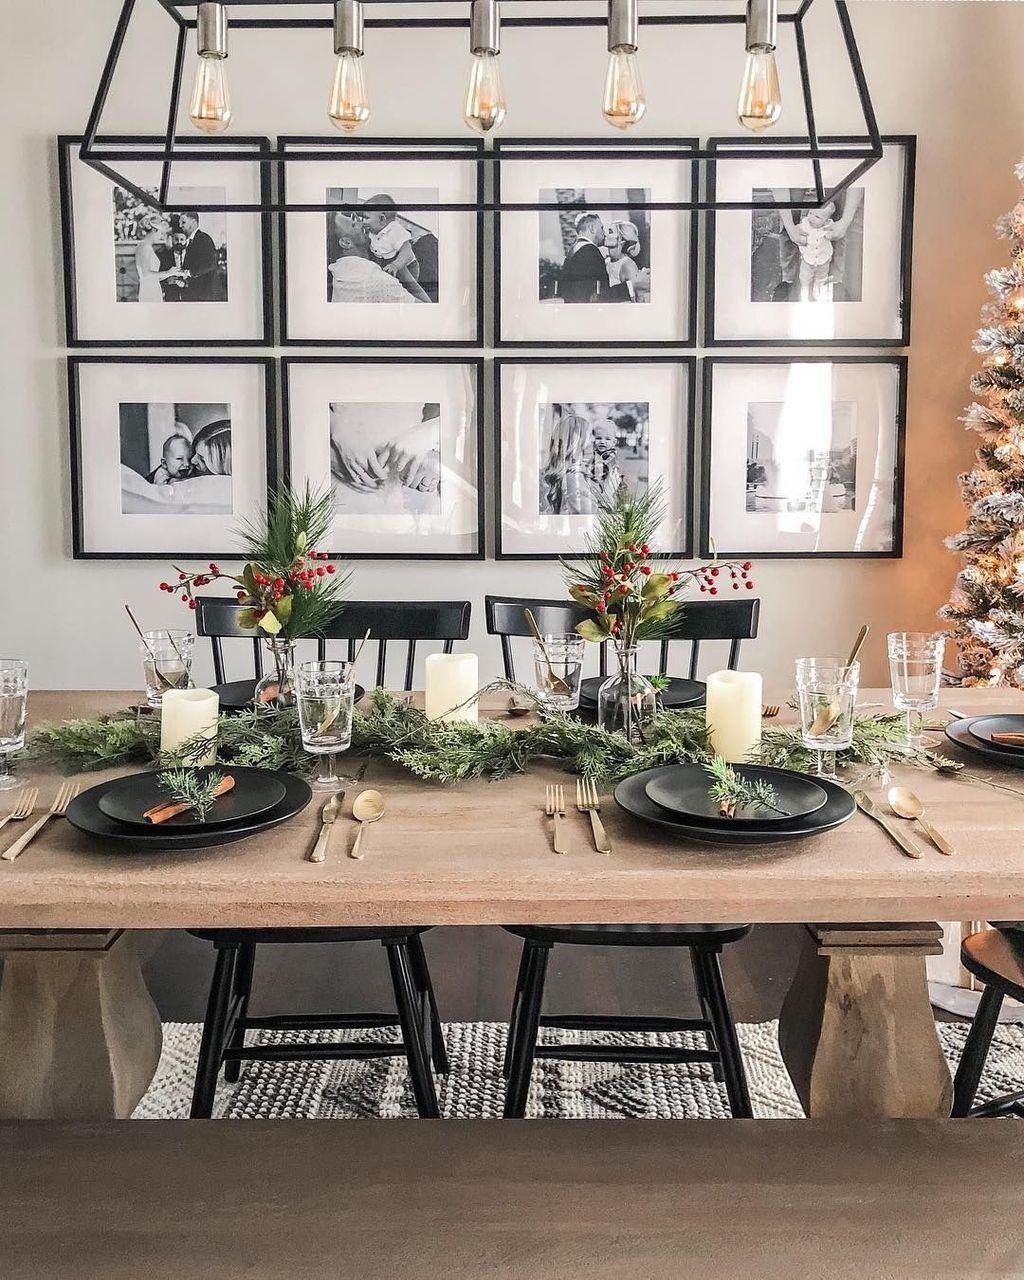 40+ Elegant Dining Room Decoration Ideas For Family